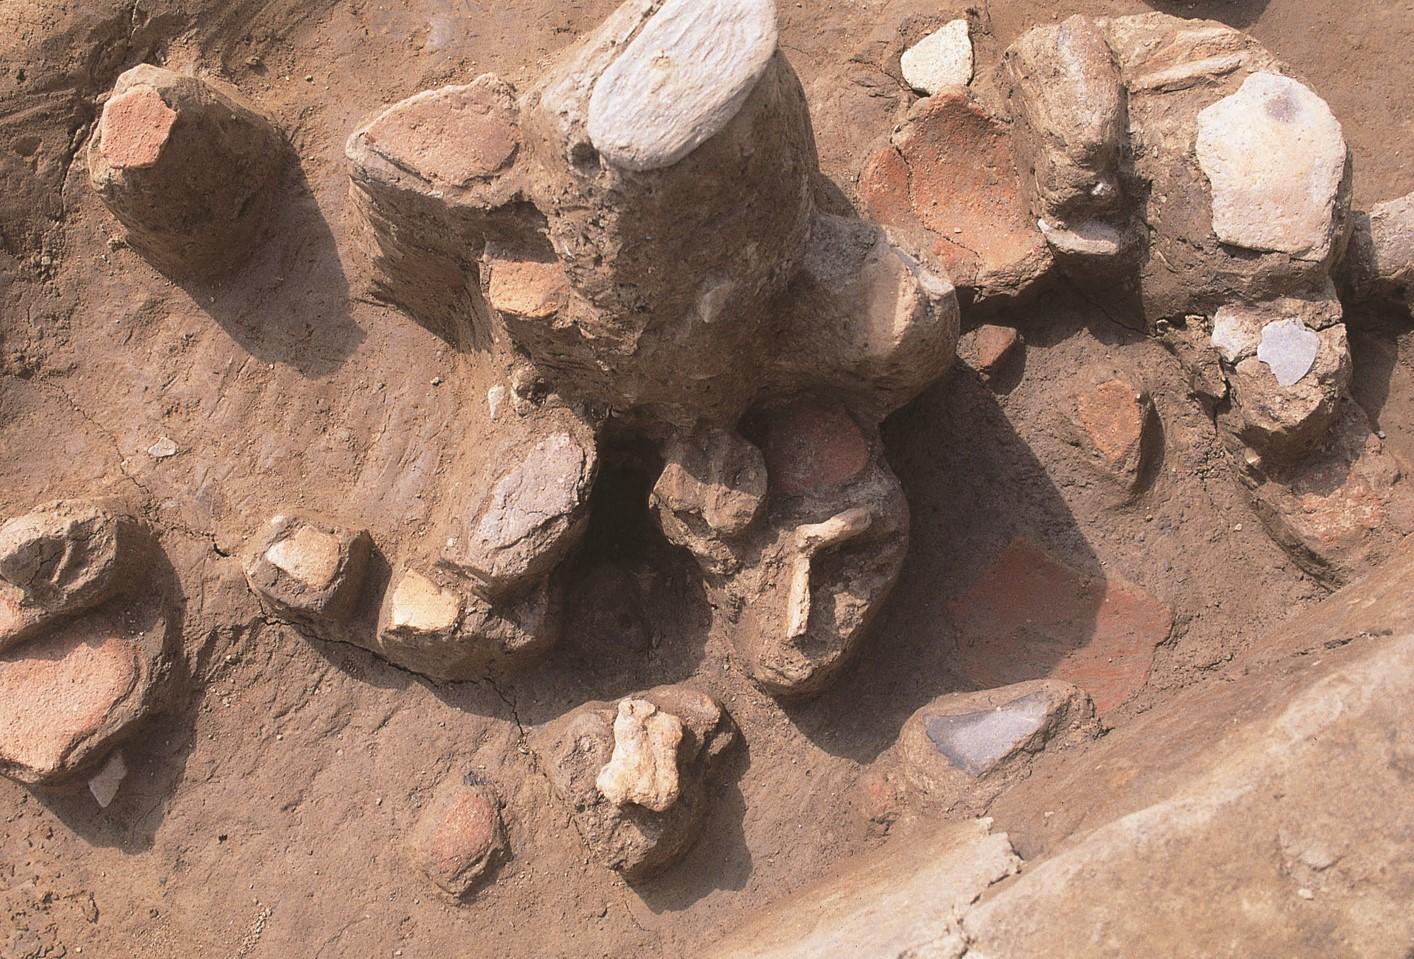 大久保遺跡袋状貯蔵穴内で出土した舶載鋳造鉄器と弥生土器